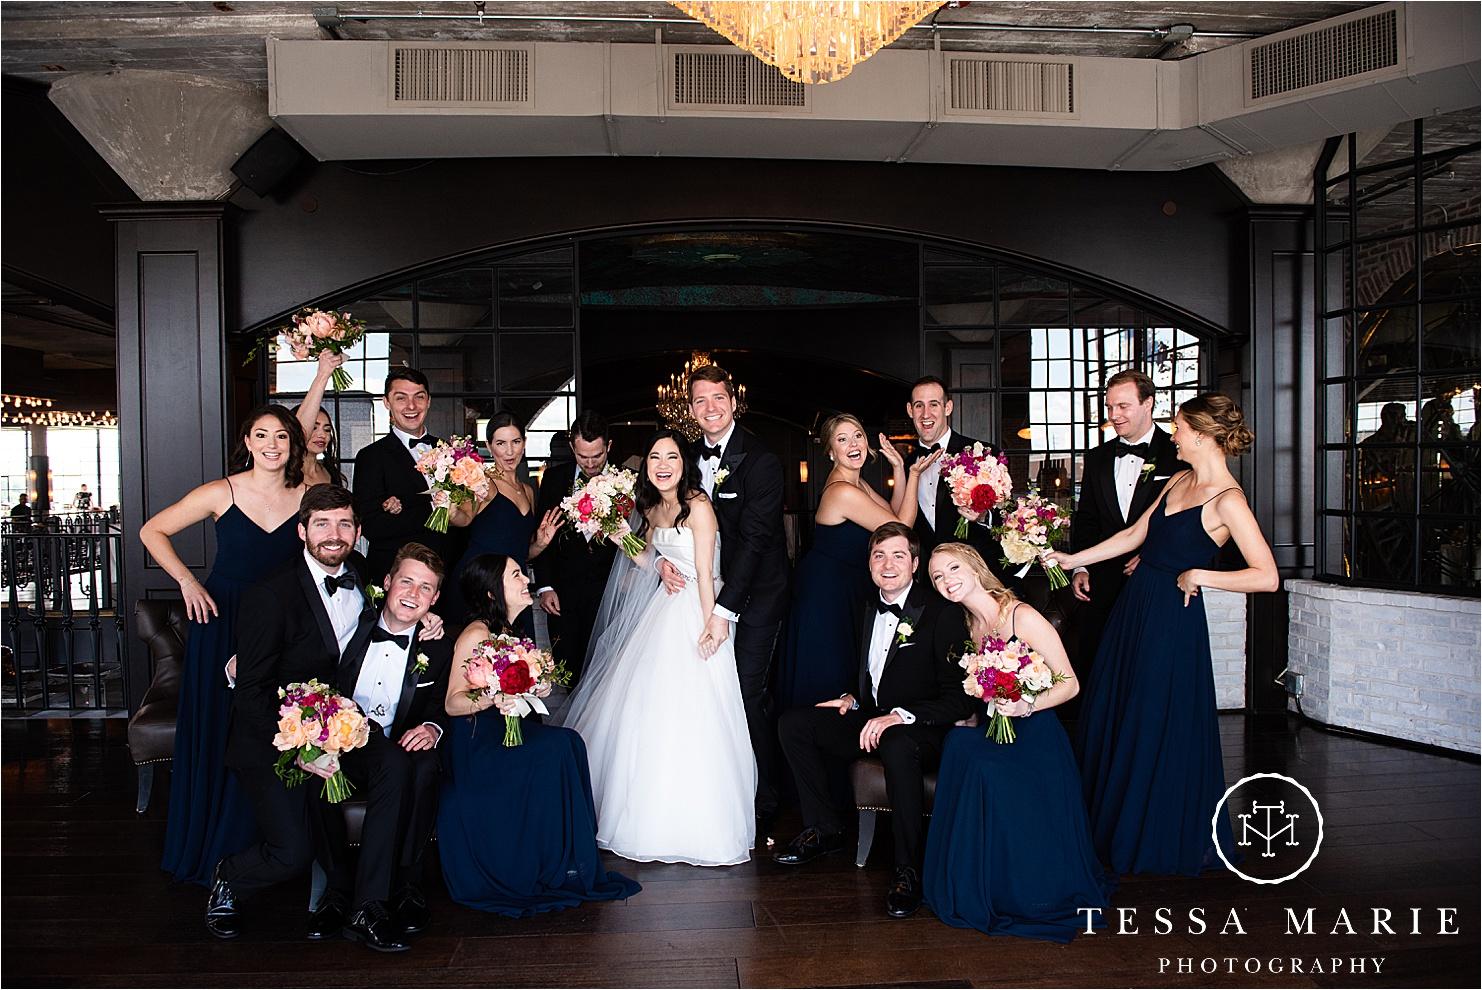 Tessa_marie_weddings_houston_wedding_photographer_The_astorian_0087.jpg